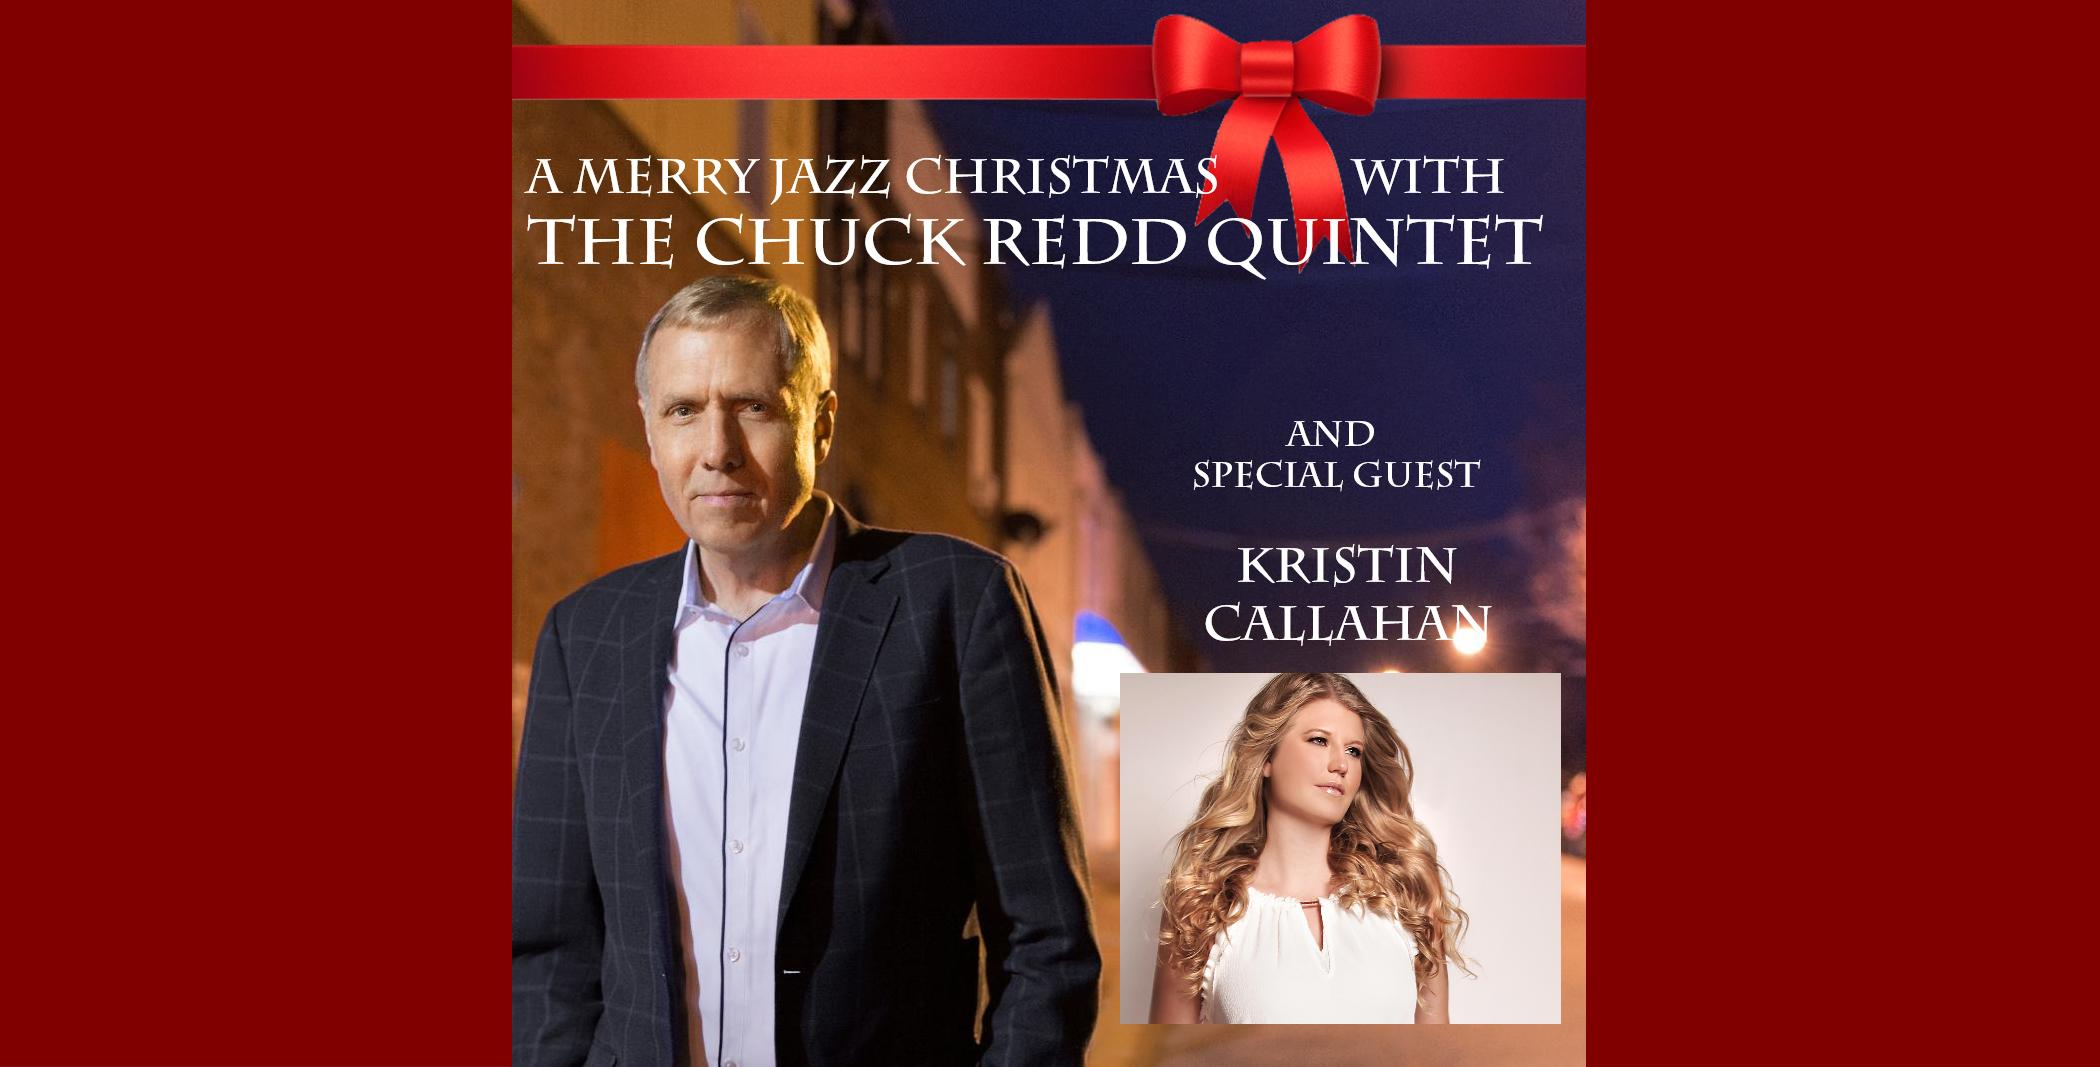 A Merry Jazz Christmas with Chuck Redd Quintet & Kristin Callahan